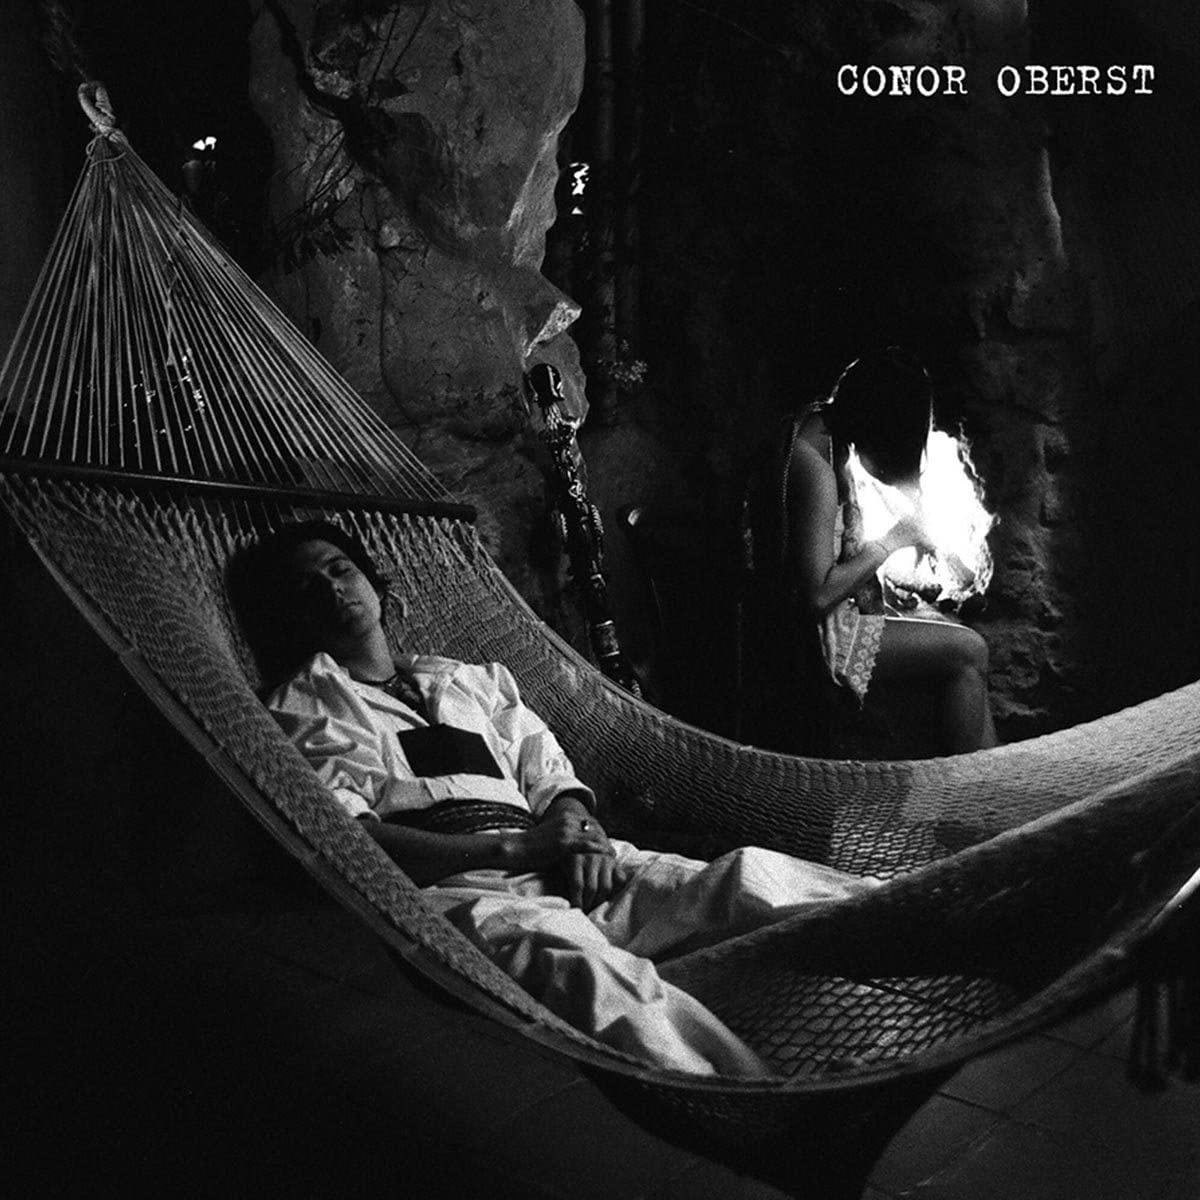 Conor Oberst – Conor Oberst